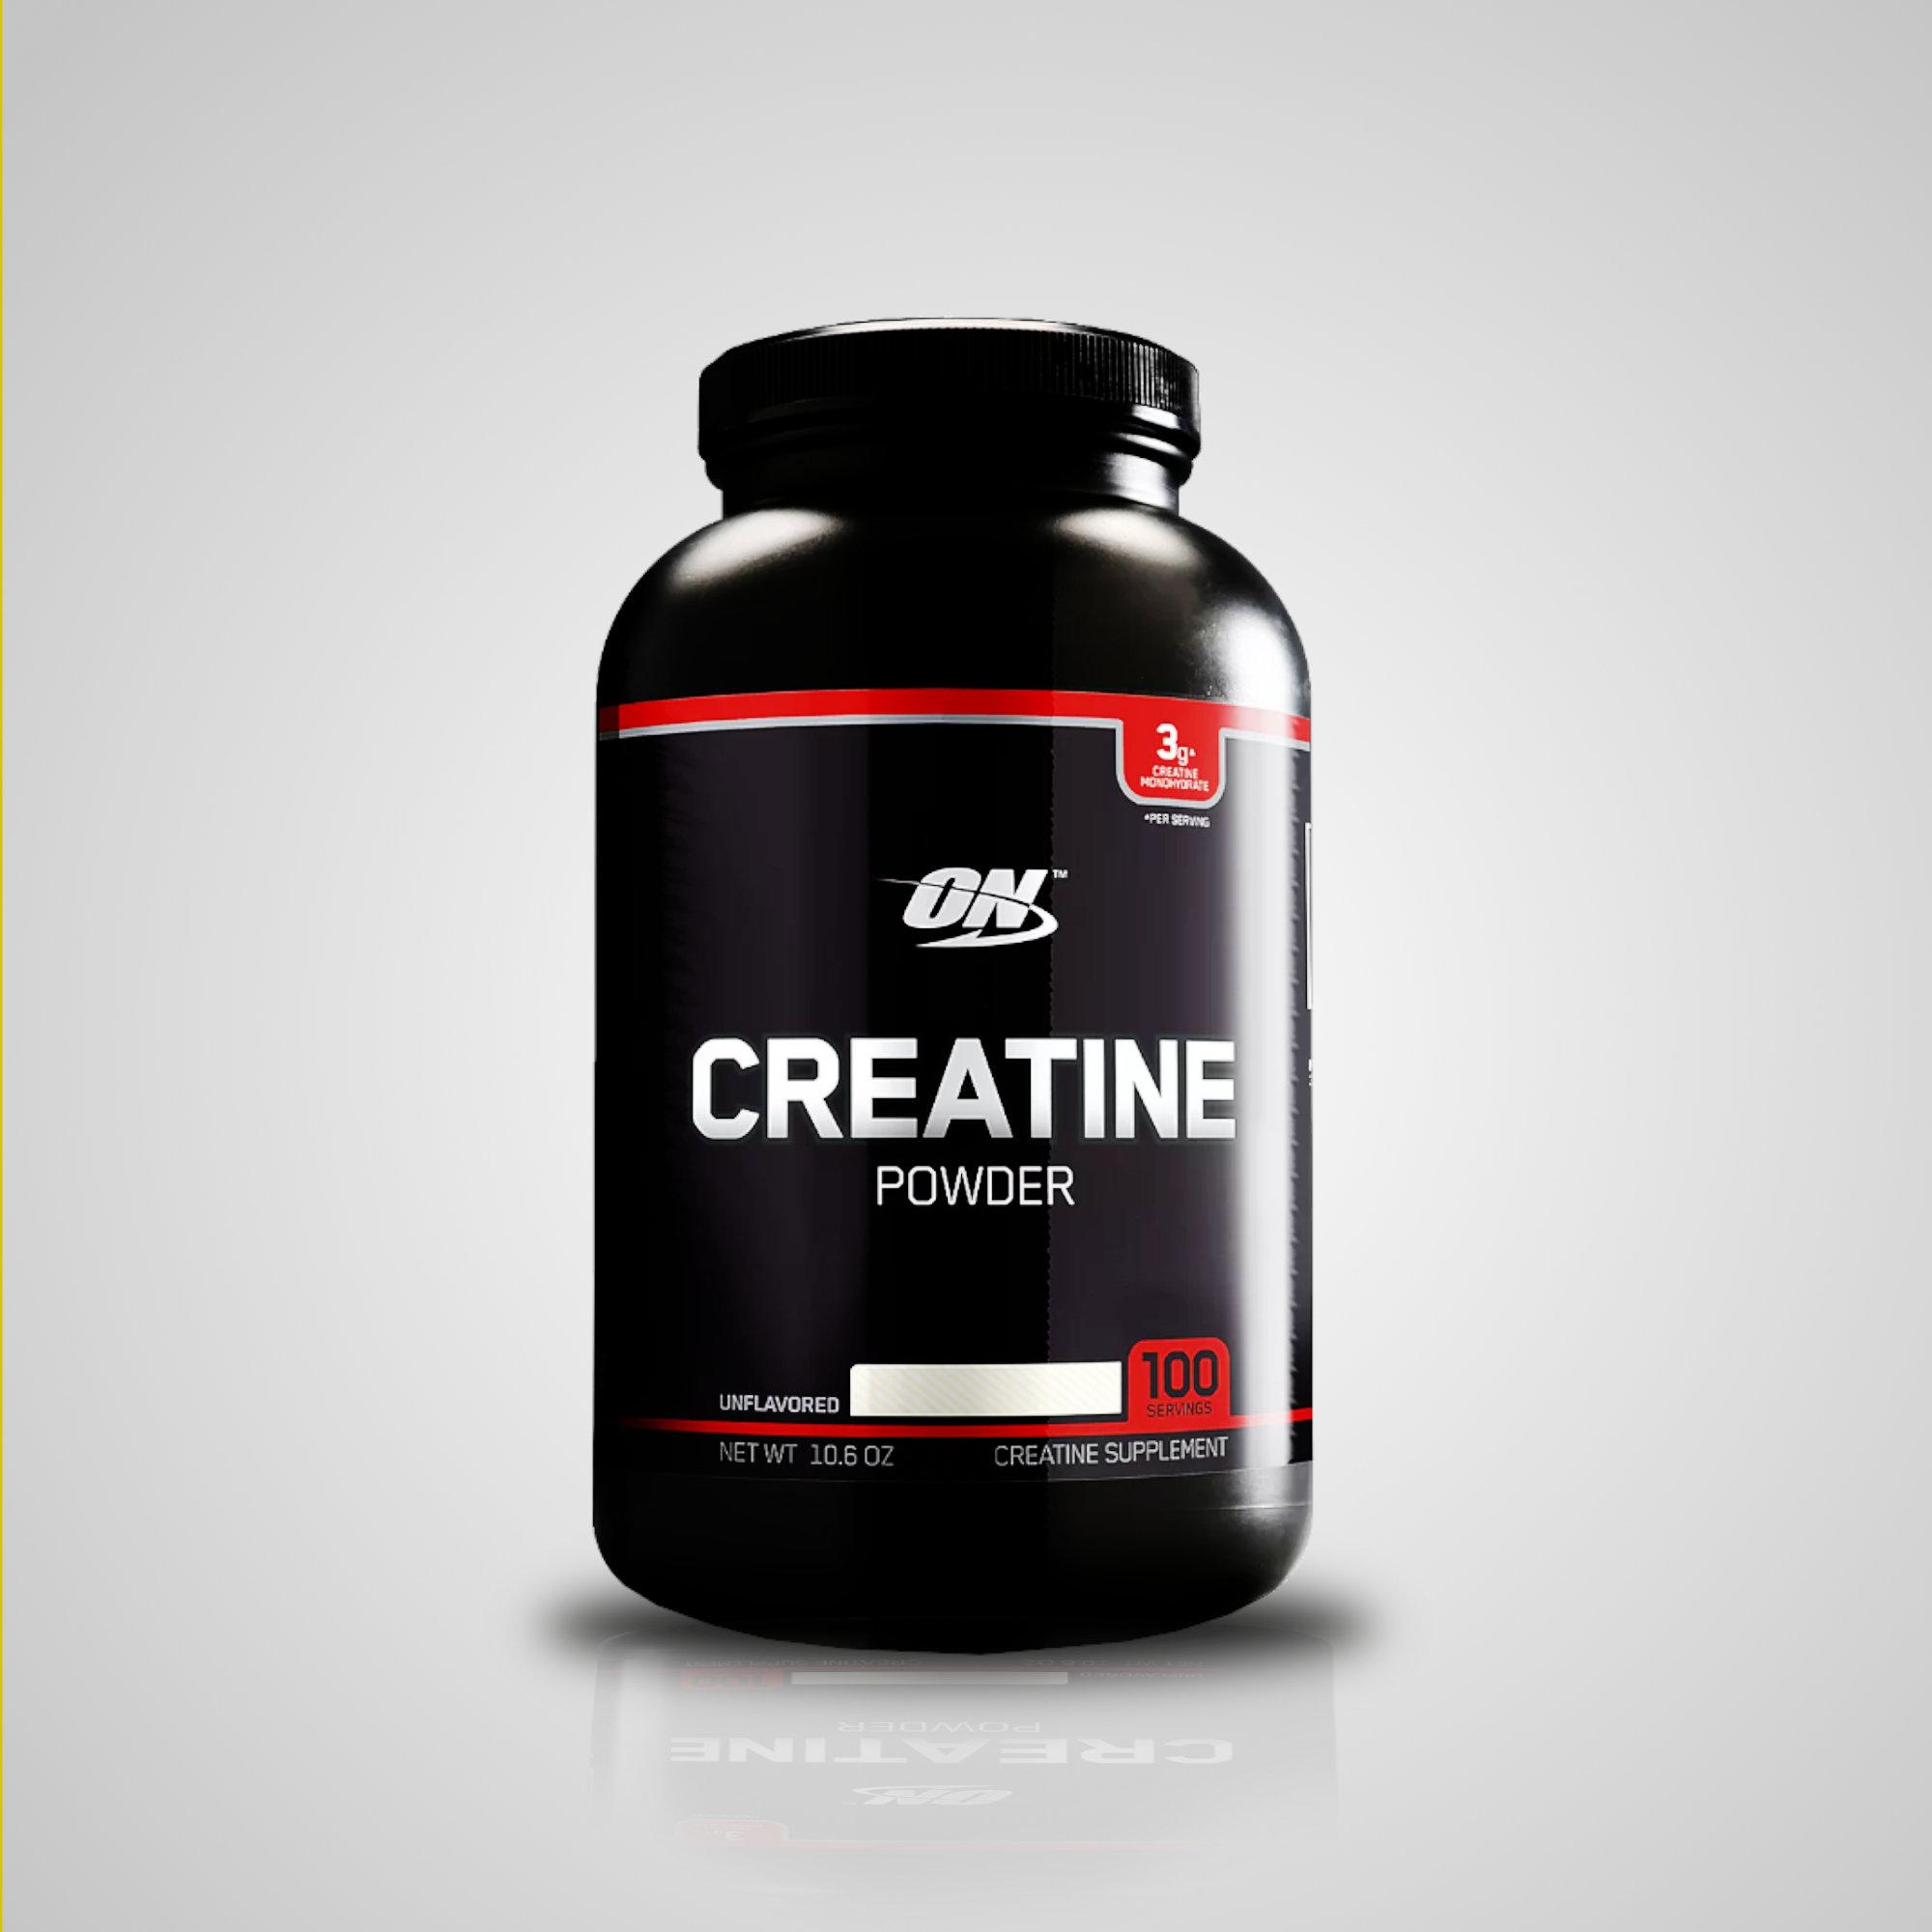 Creatina Powder (150g) - Black Line - Optimum Nutrition